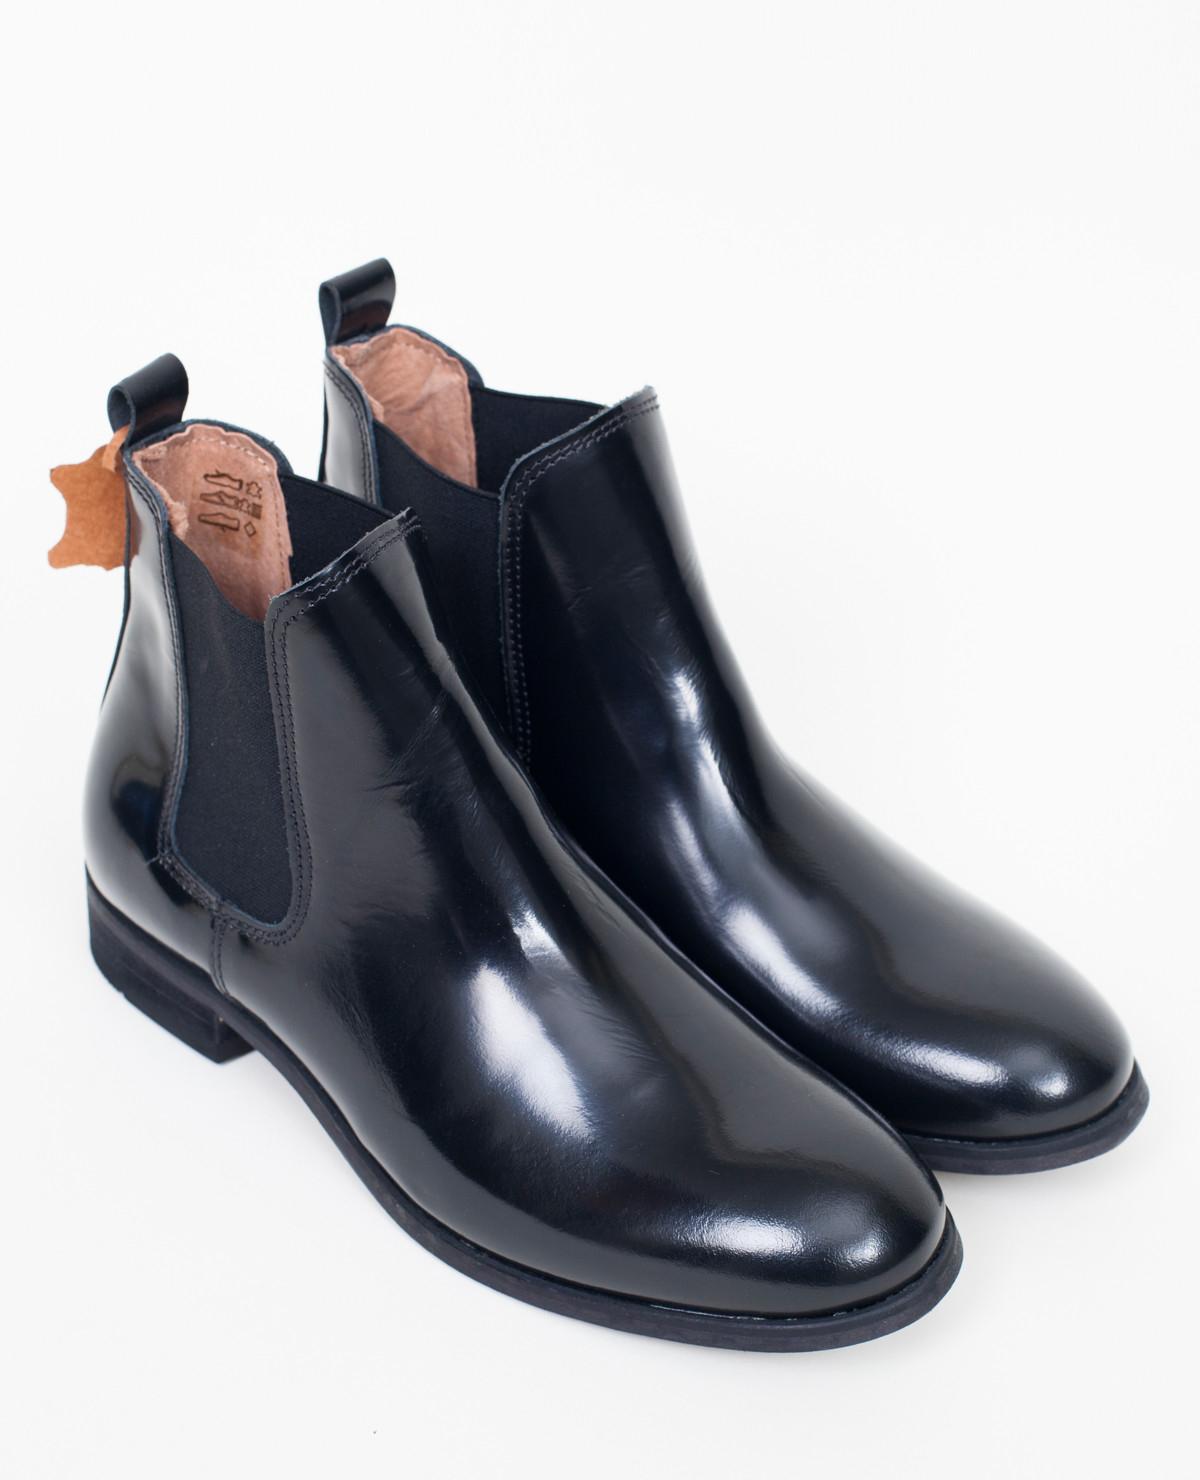 shoe the bear chelsea boot black in black lyst. Black Bedroom Furniture Sets. Home Design Ideas